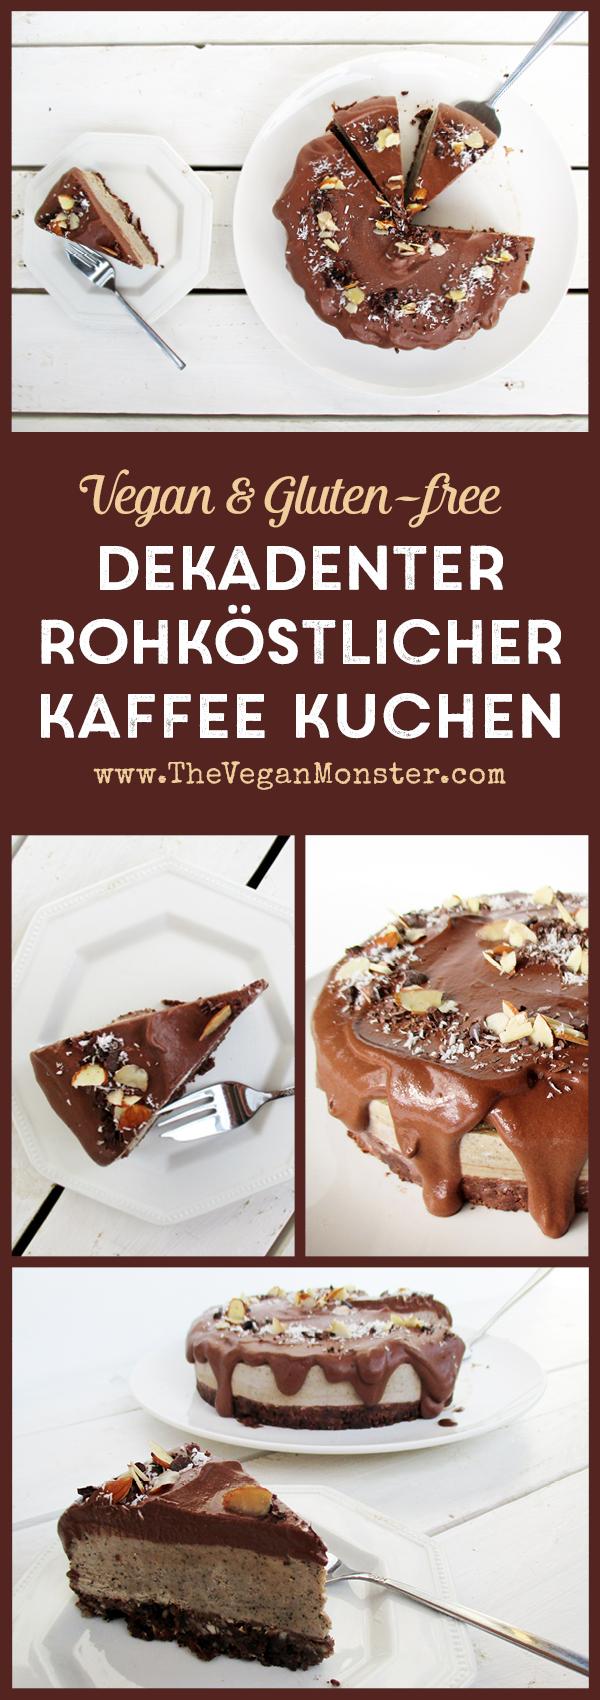 Roh Veganer Glutenfreier Dekadenter Kaffee Kuchen